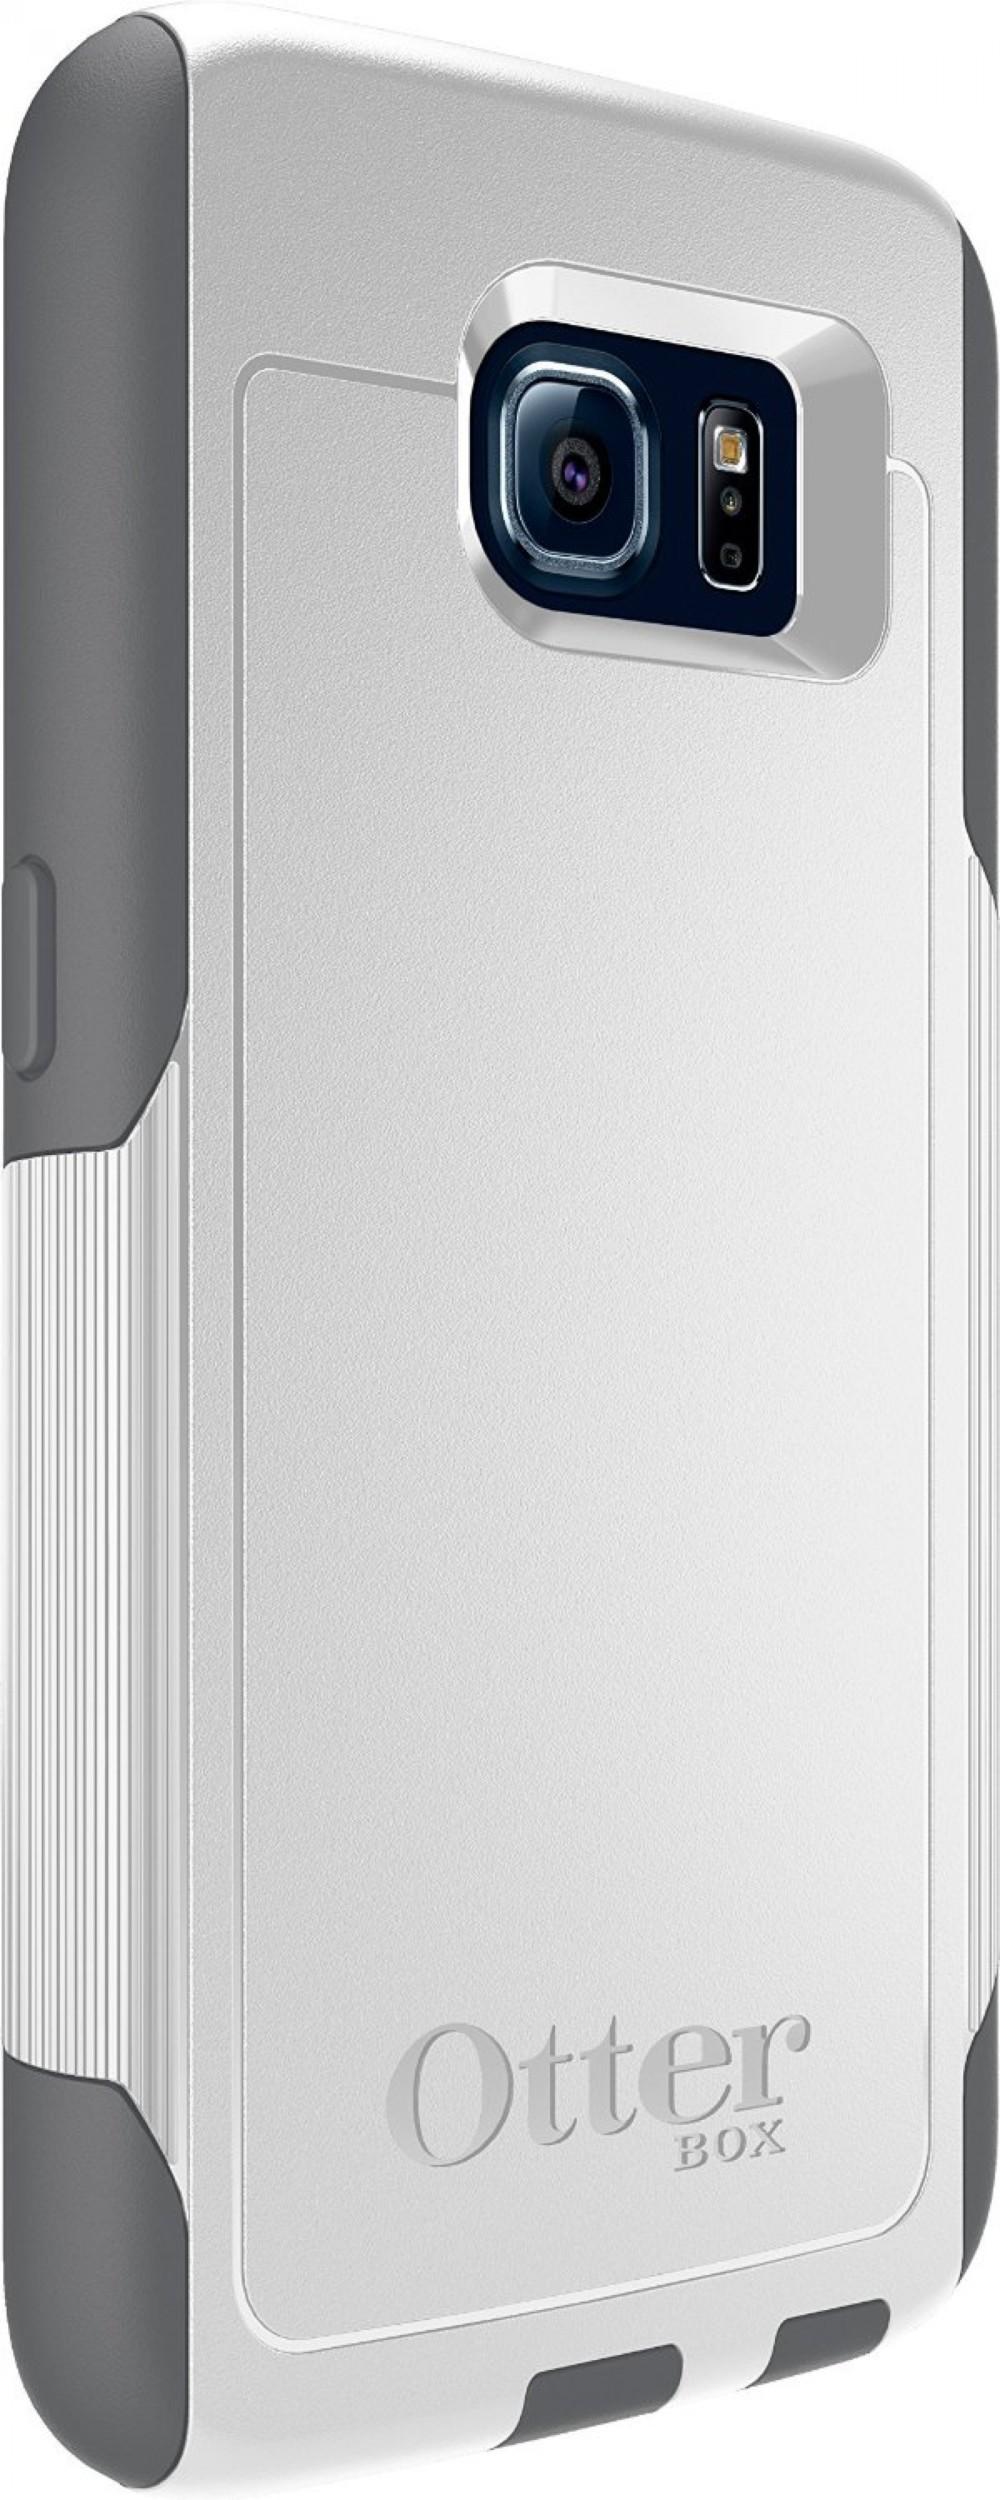 Galaxy-S6-OtterBox-Commuter-5-1900x4750_c